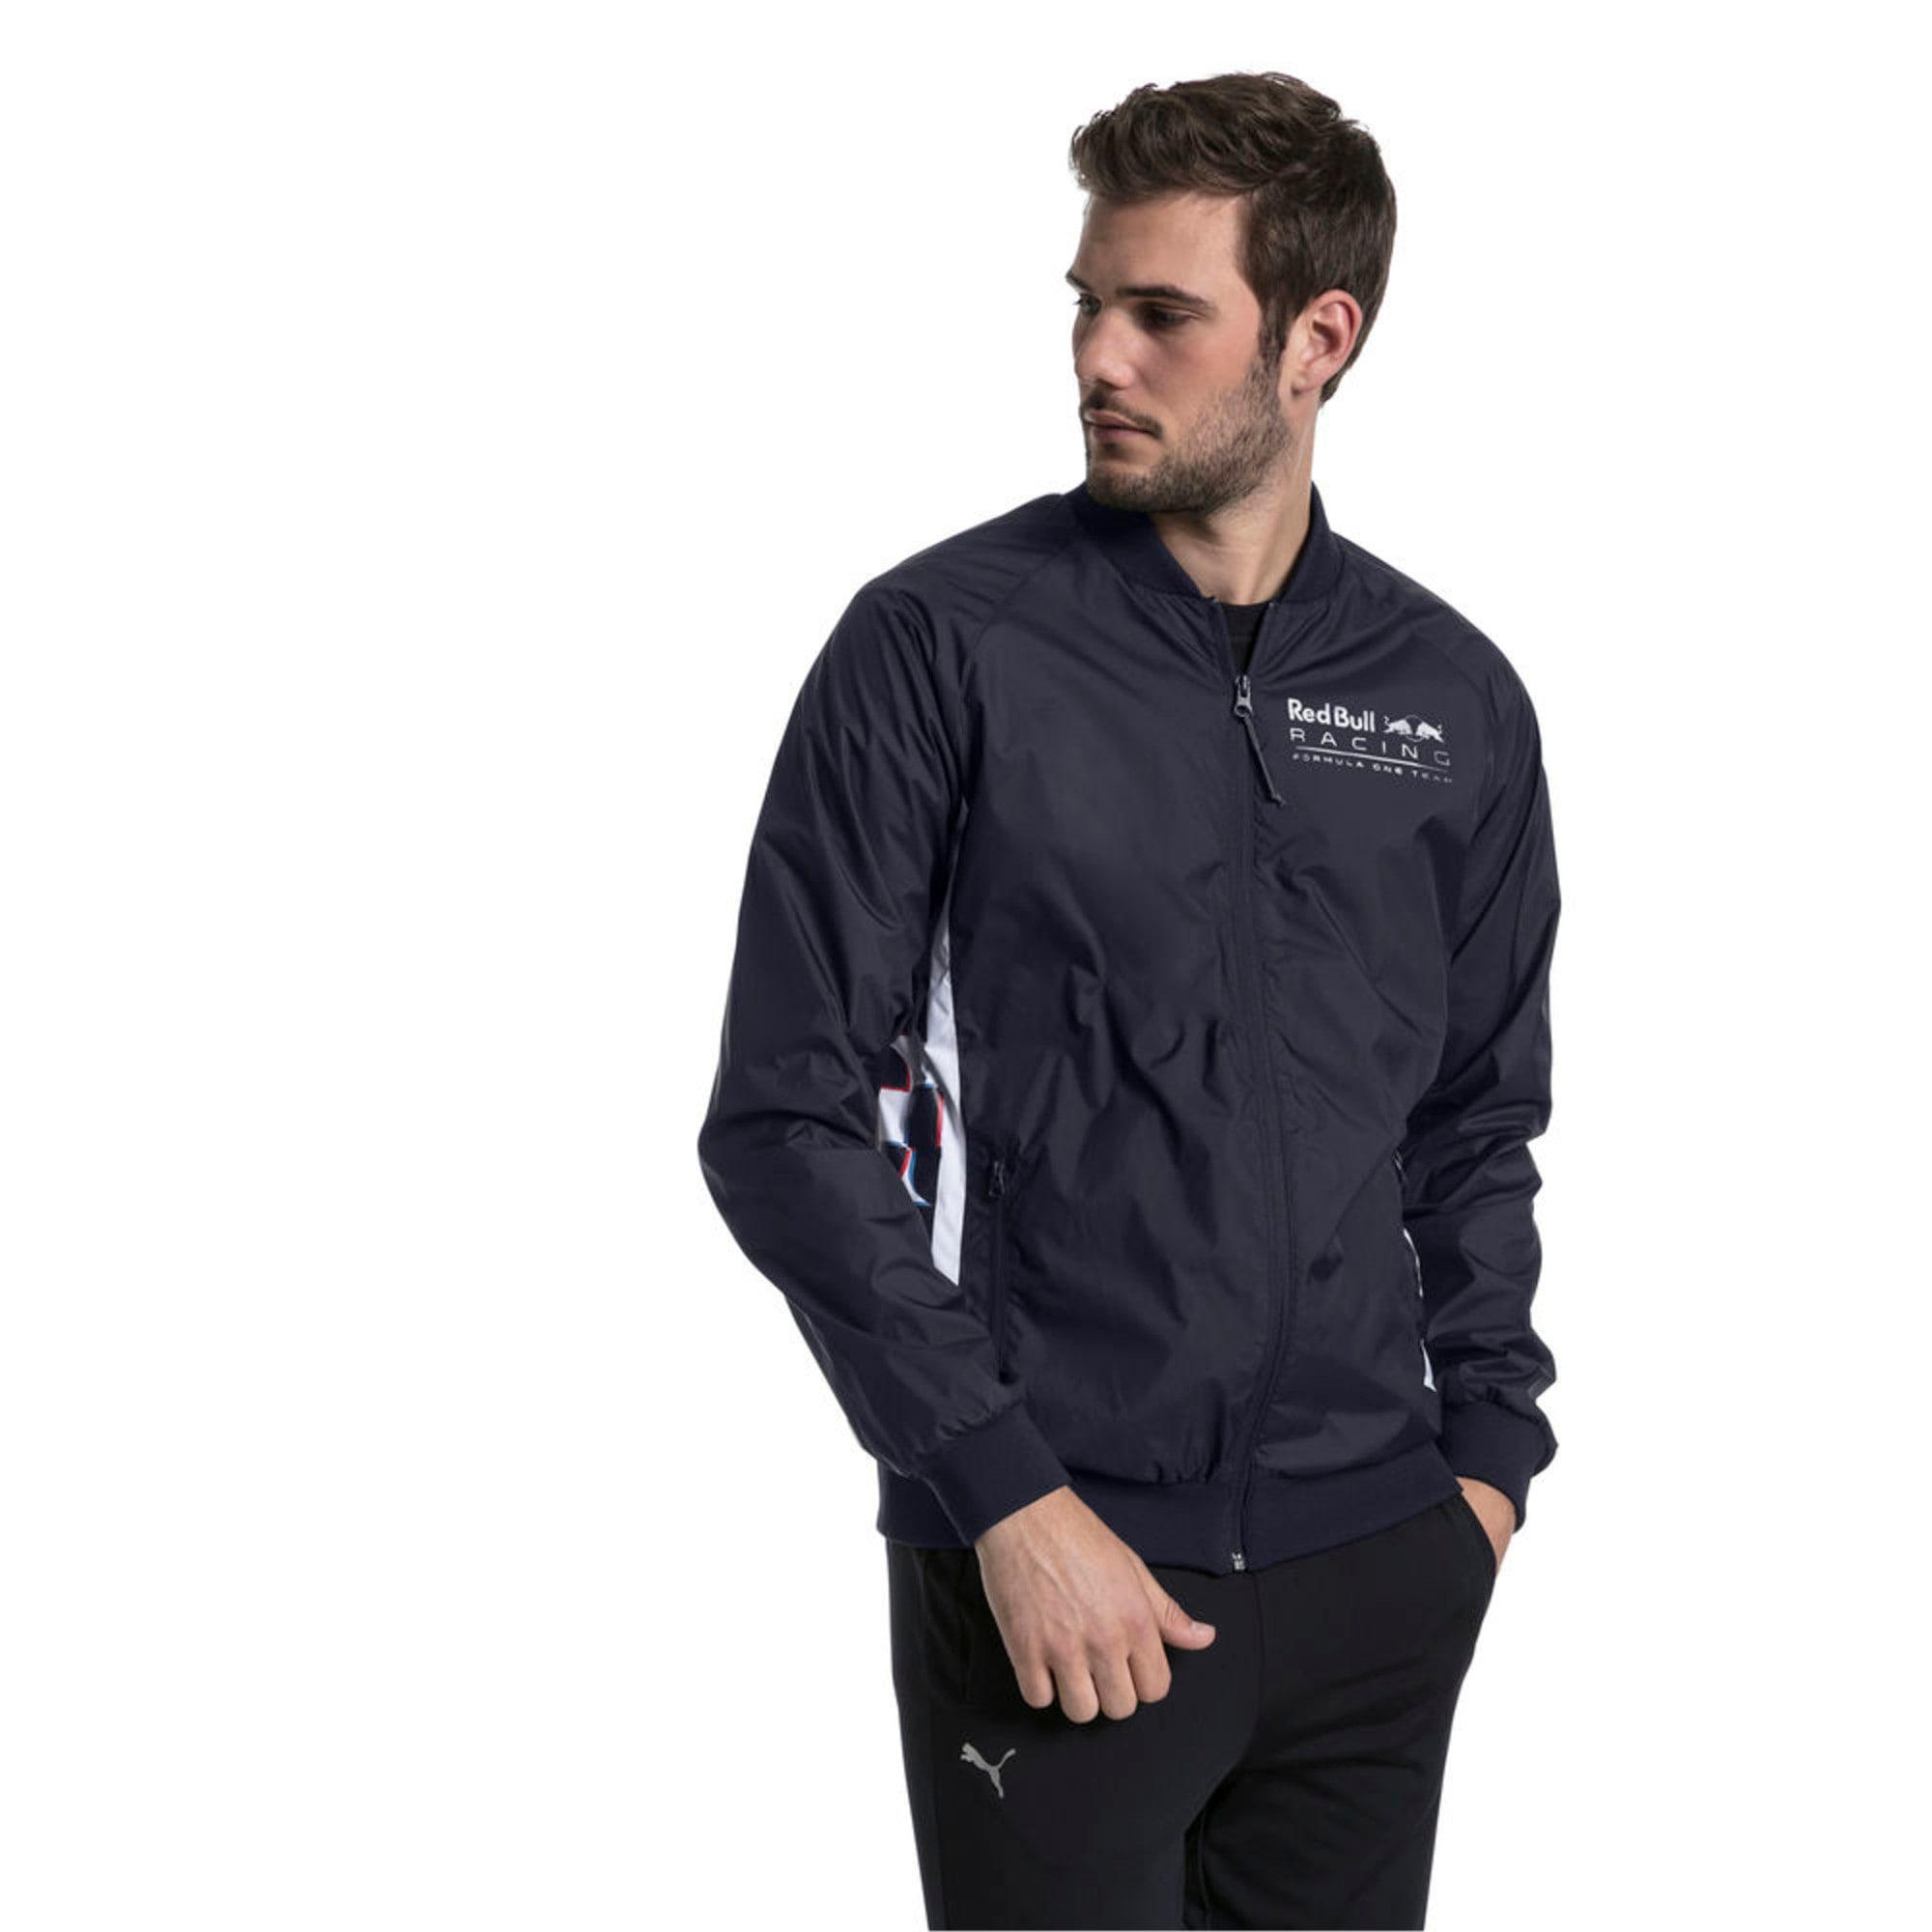 Thumbnail 2 of Red Bull Racing NightCat Men's Jacket, NIGHT SKY, medium-IND